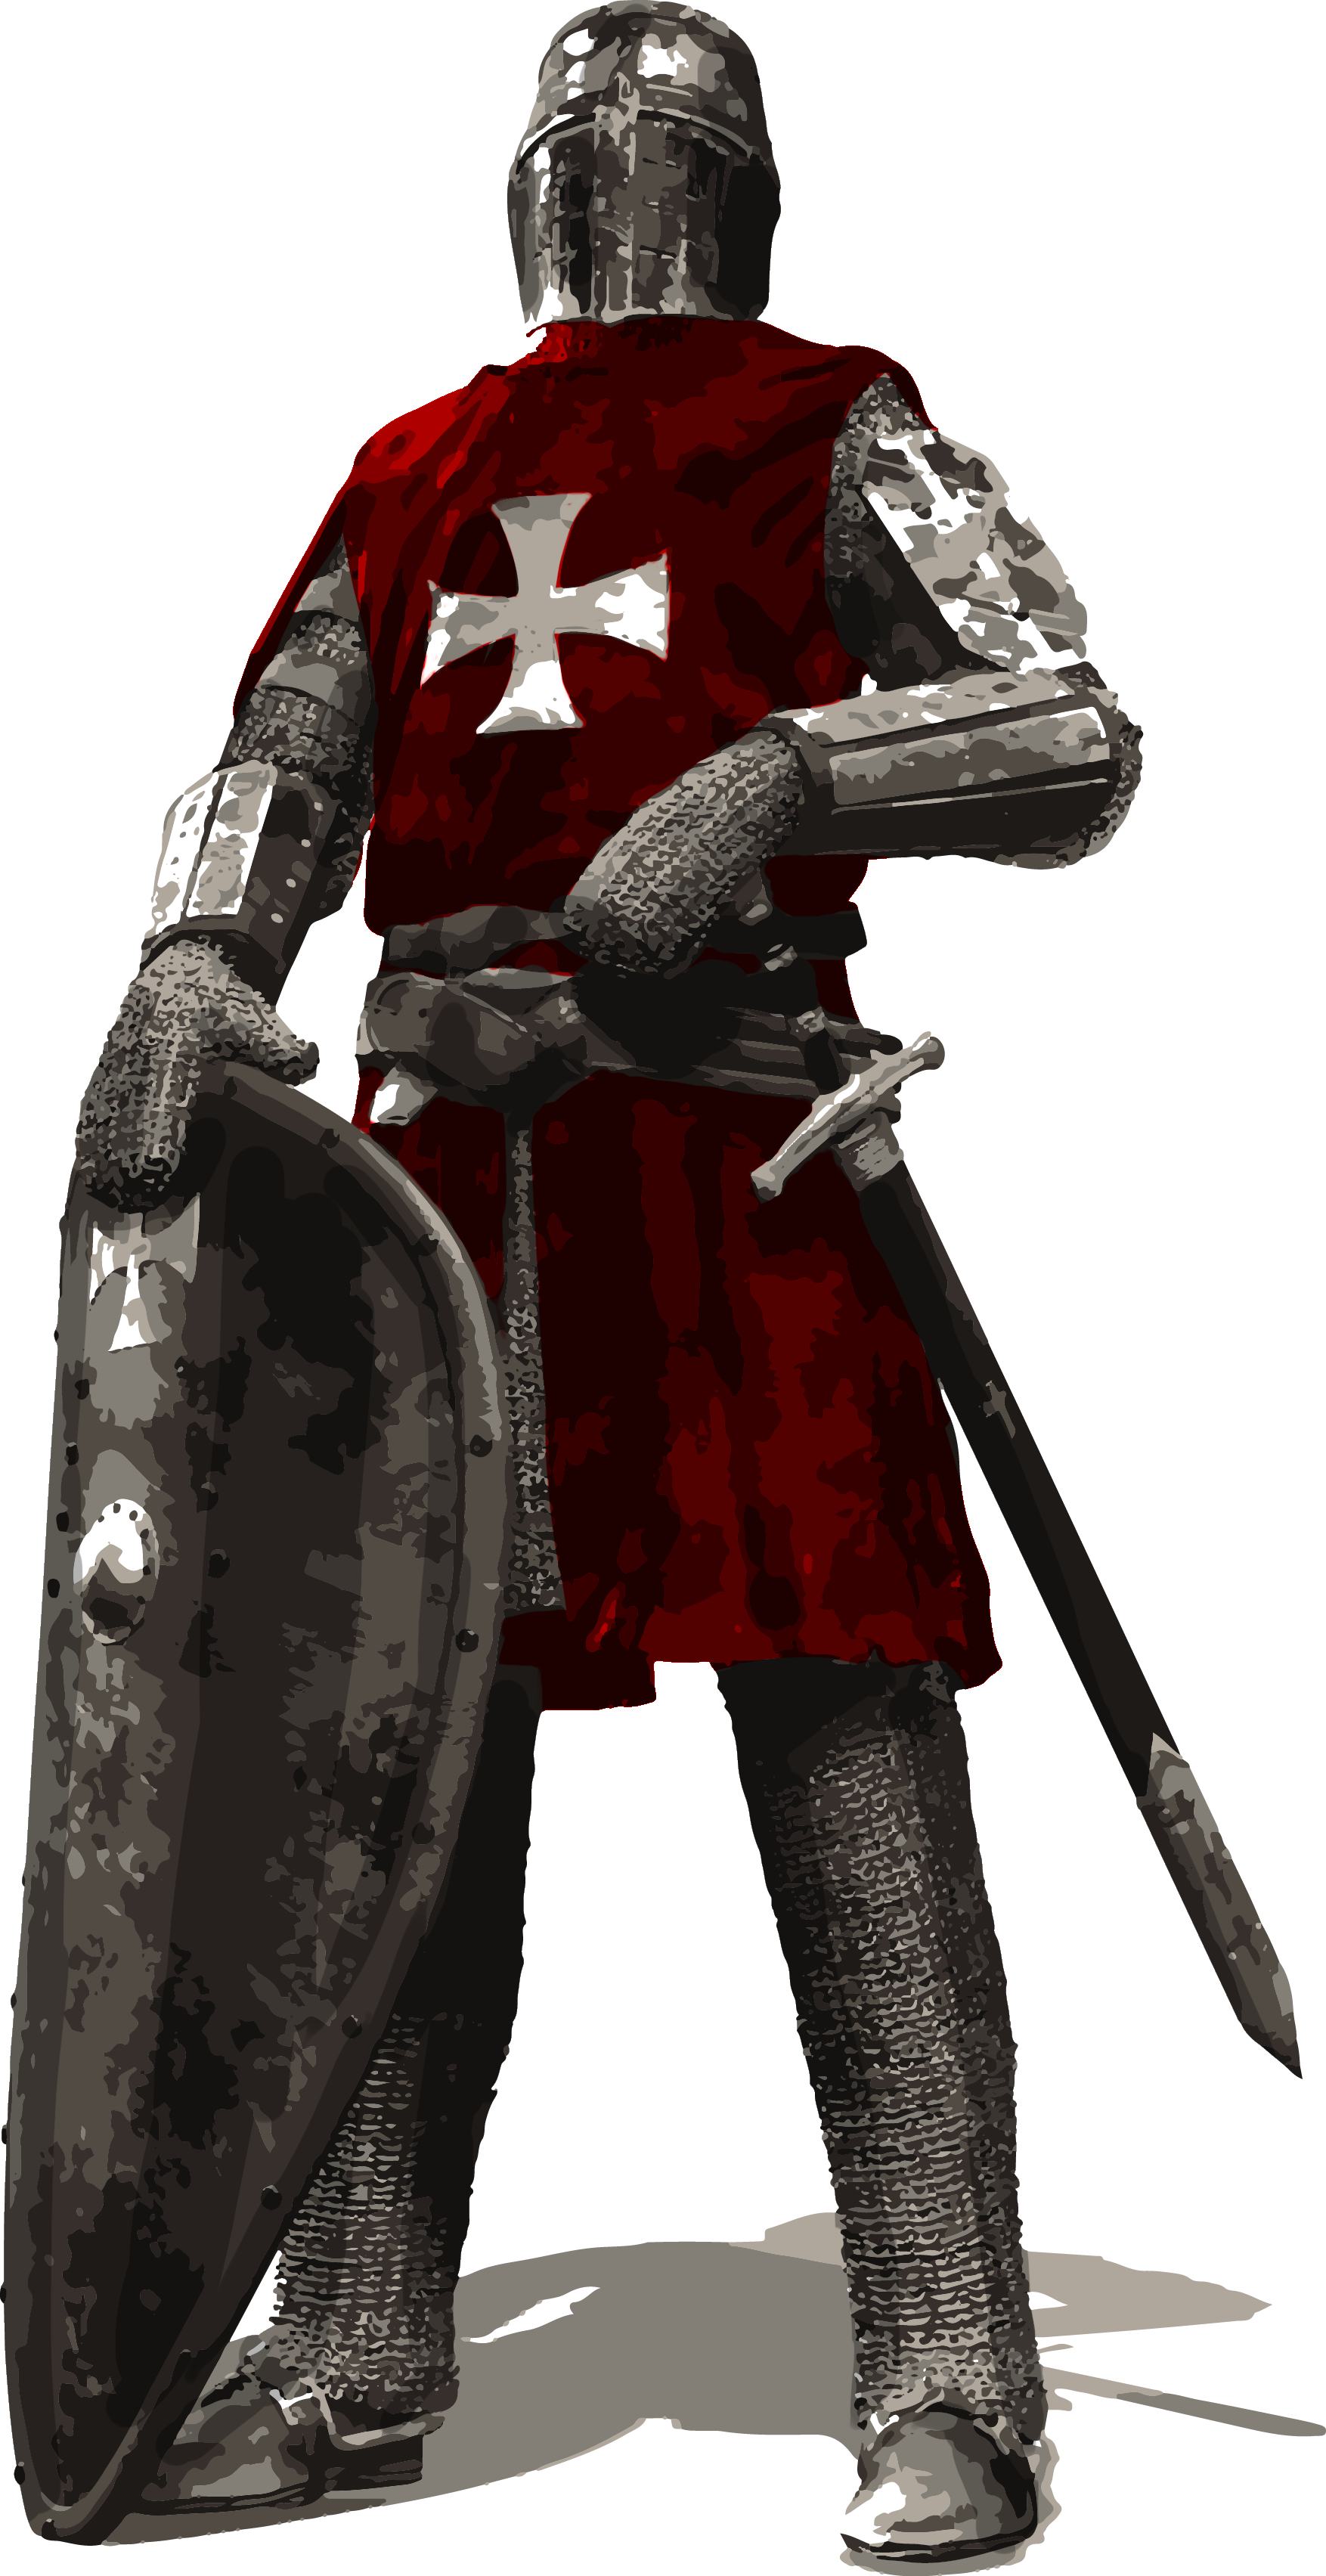 Lancelot s blog i. Knight clipart clear